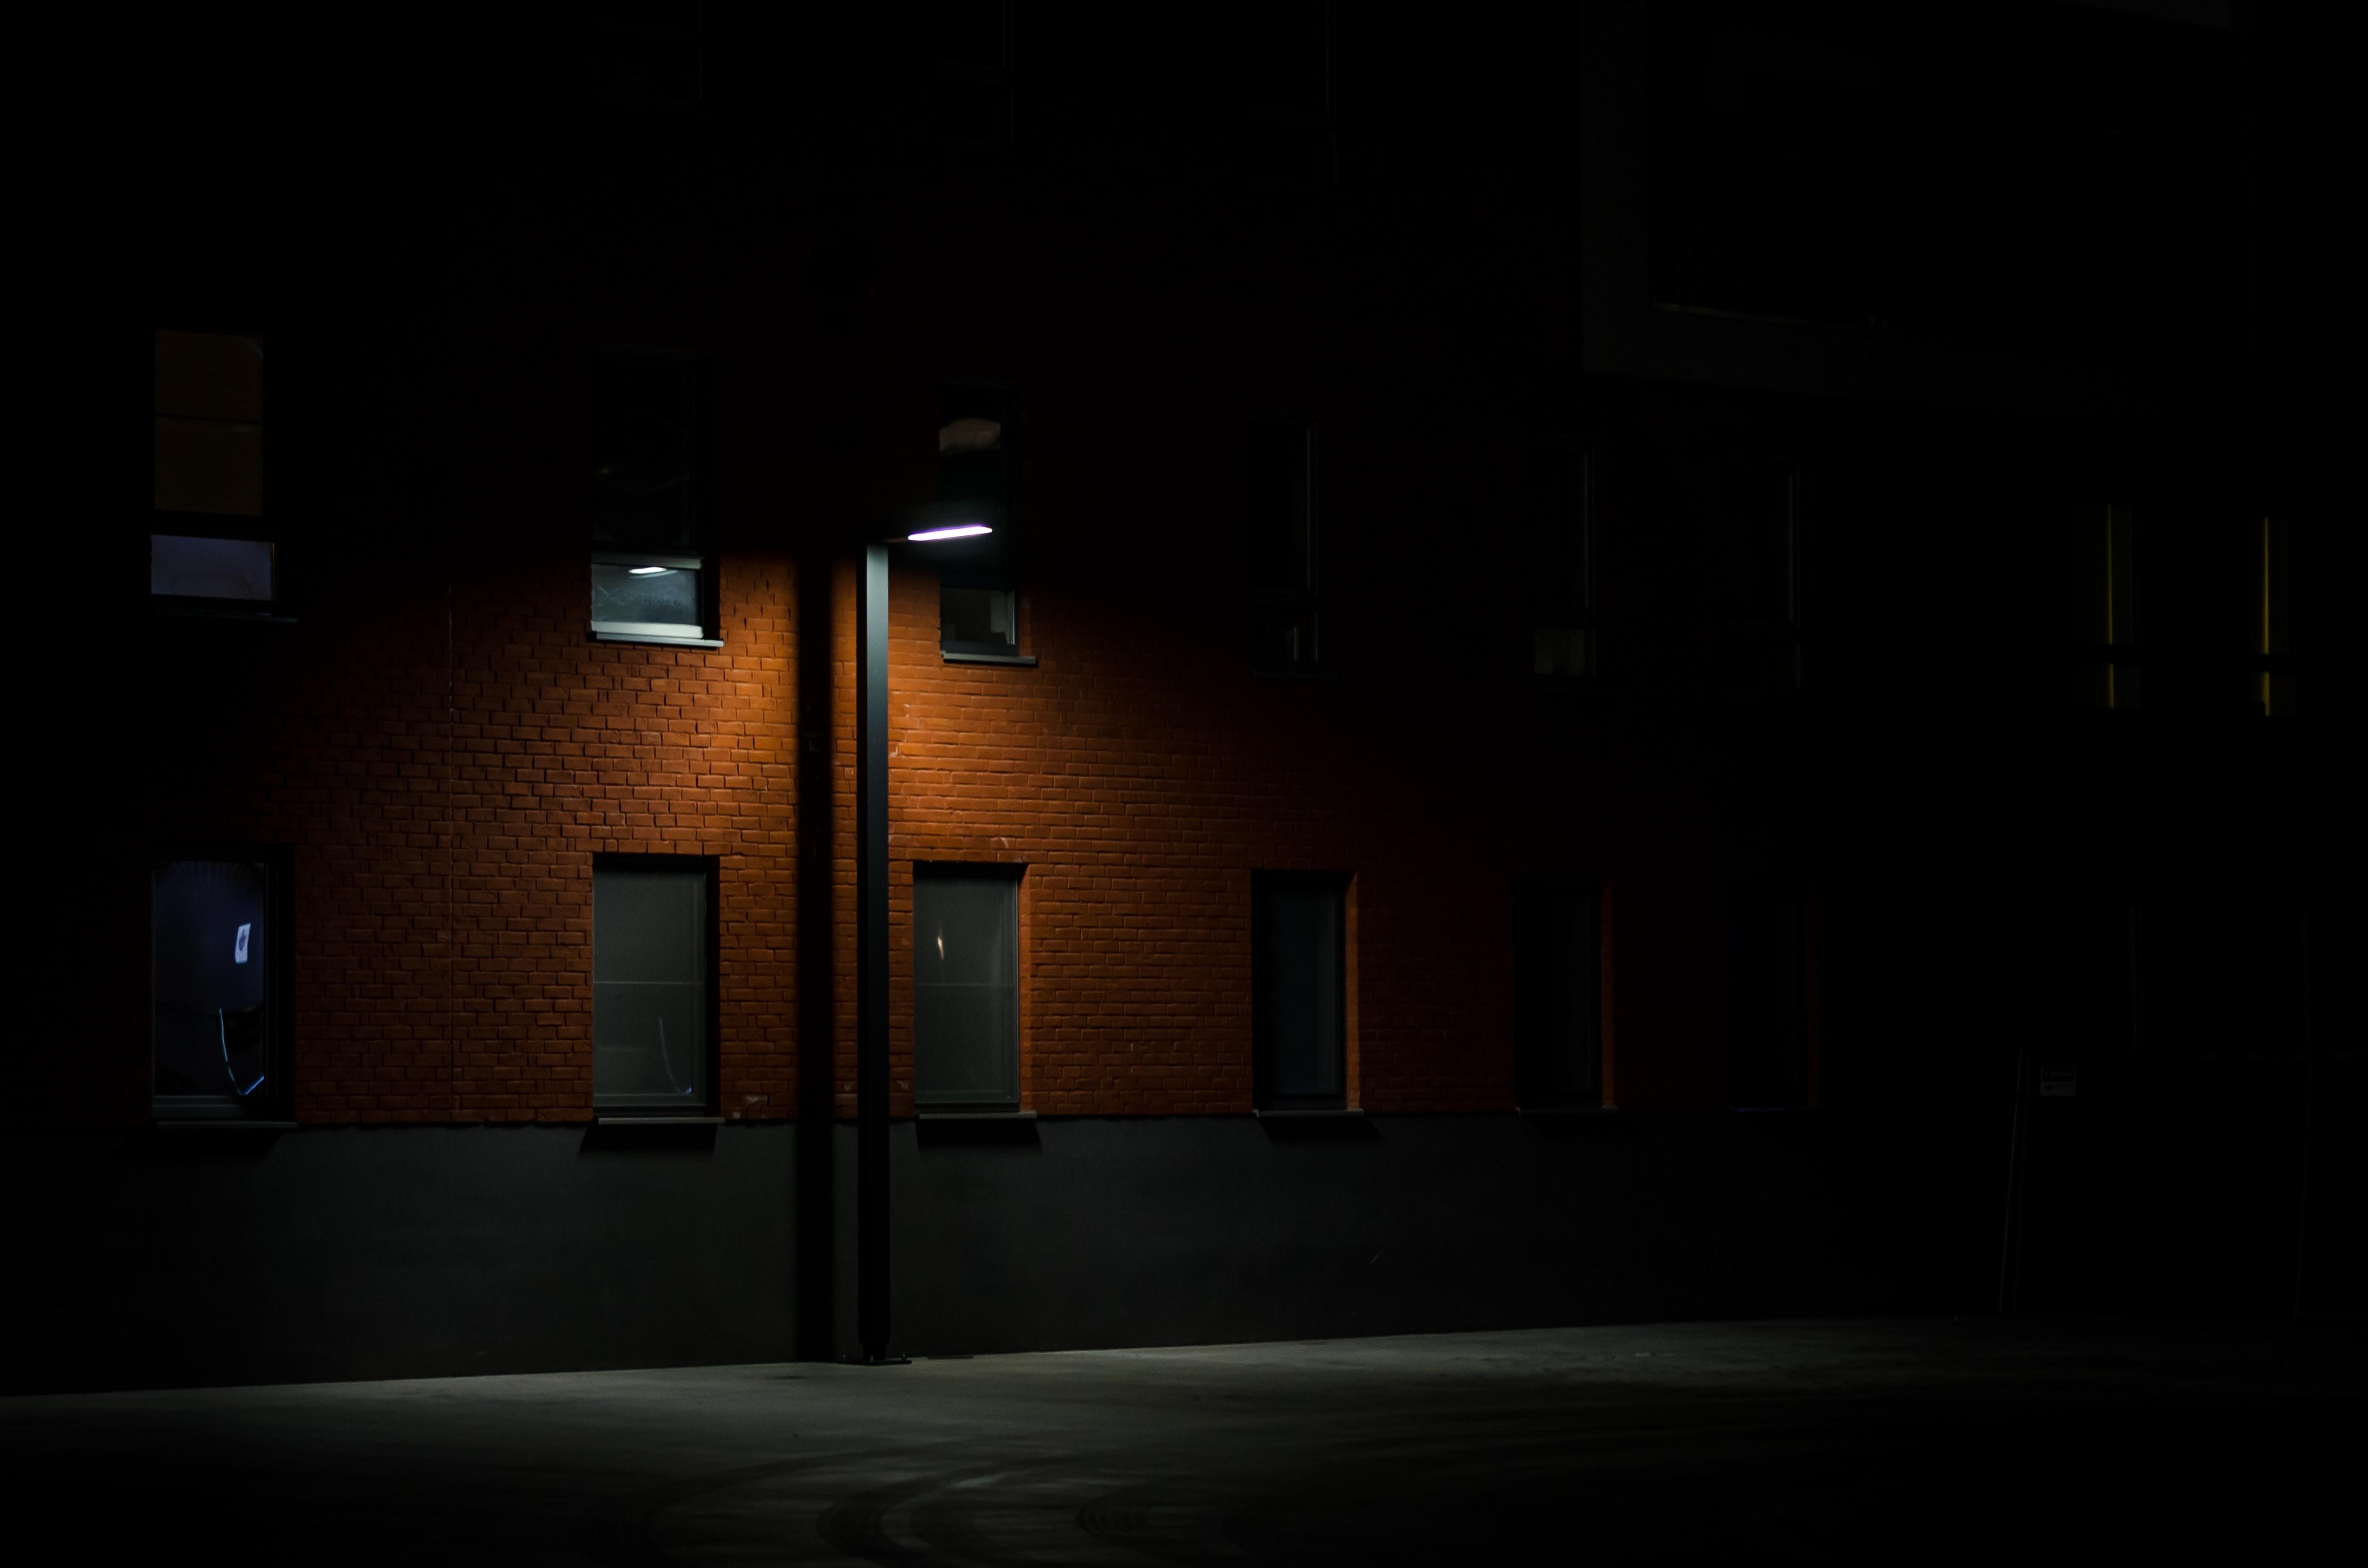 Lonely Light Photo By Jonas Verstuyft Verstuyftj On